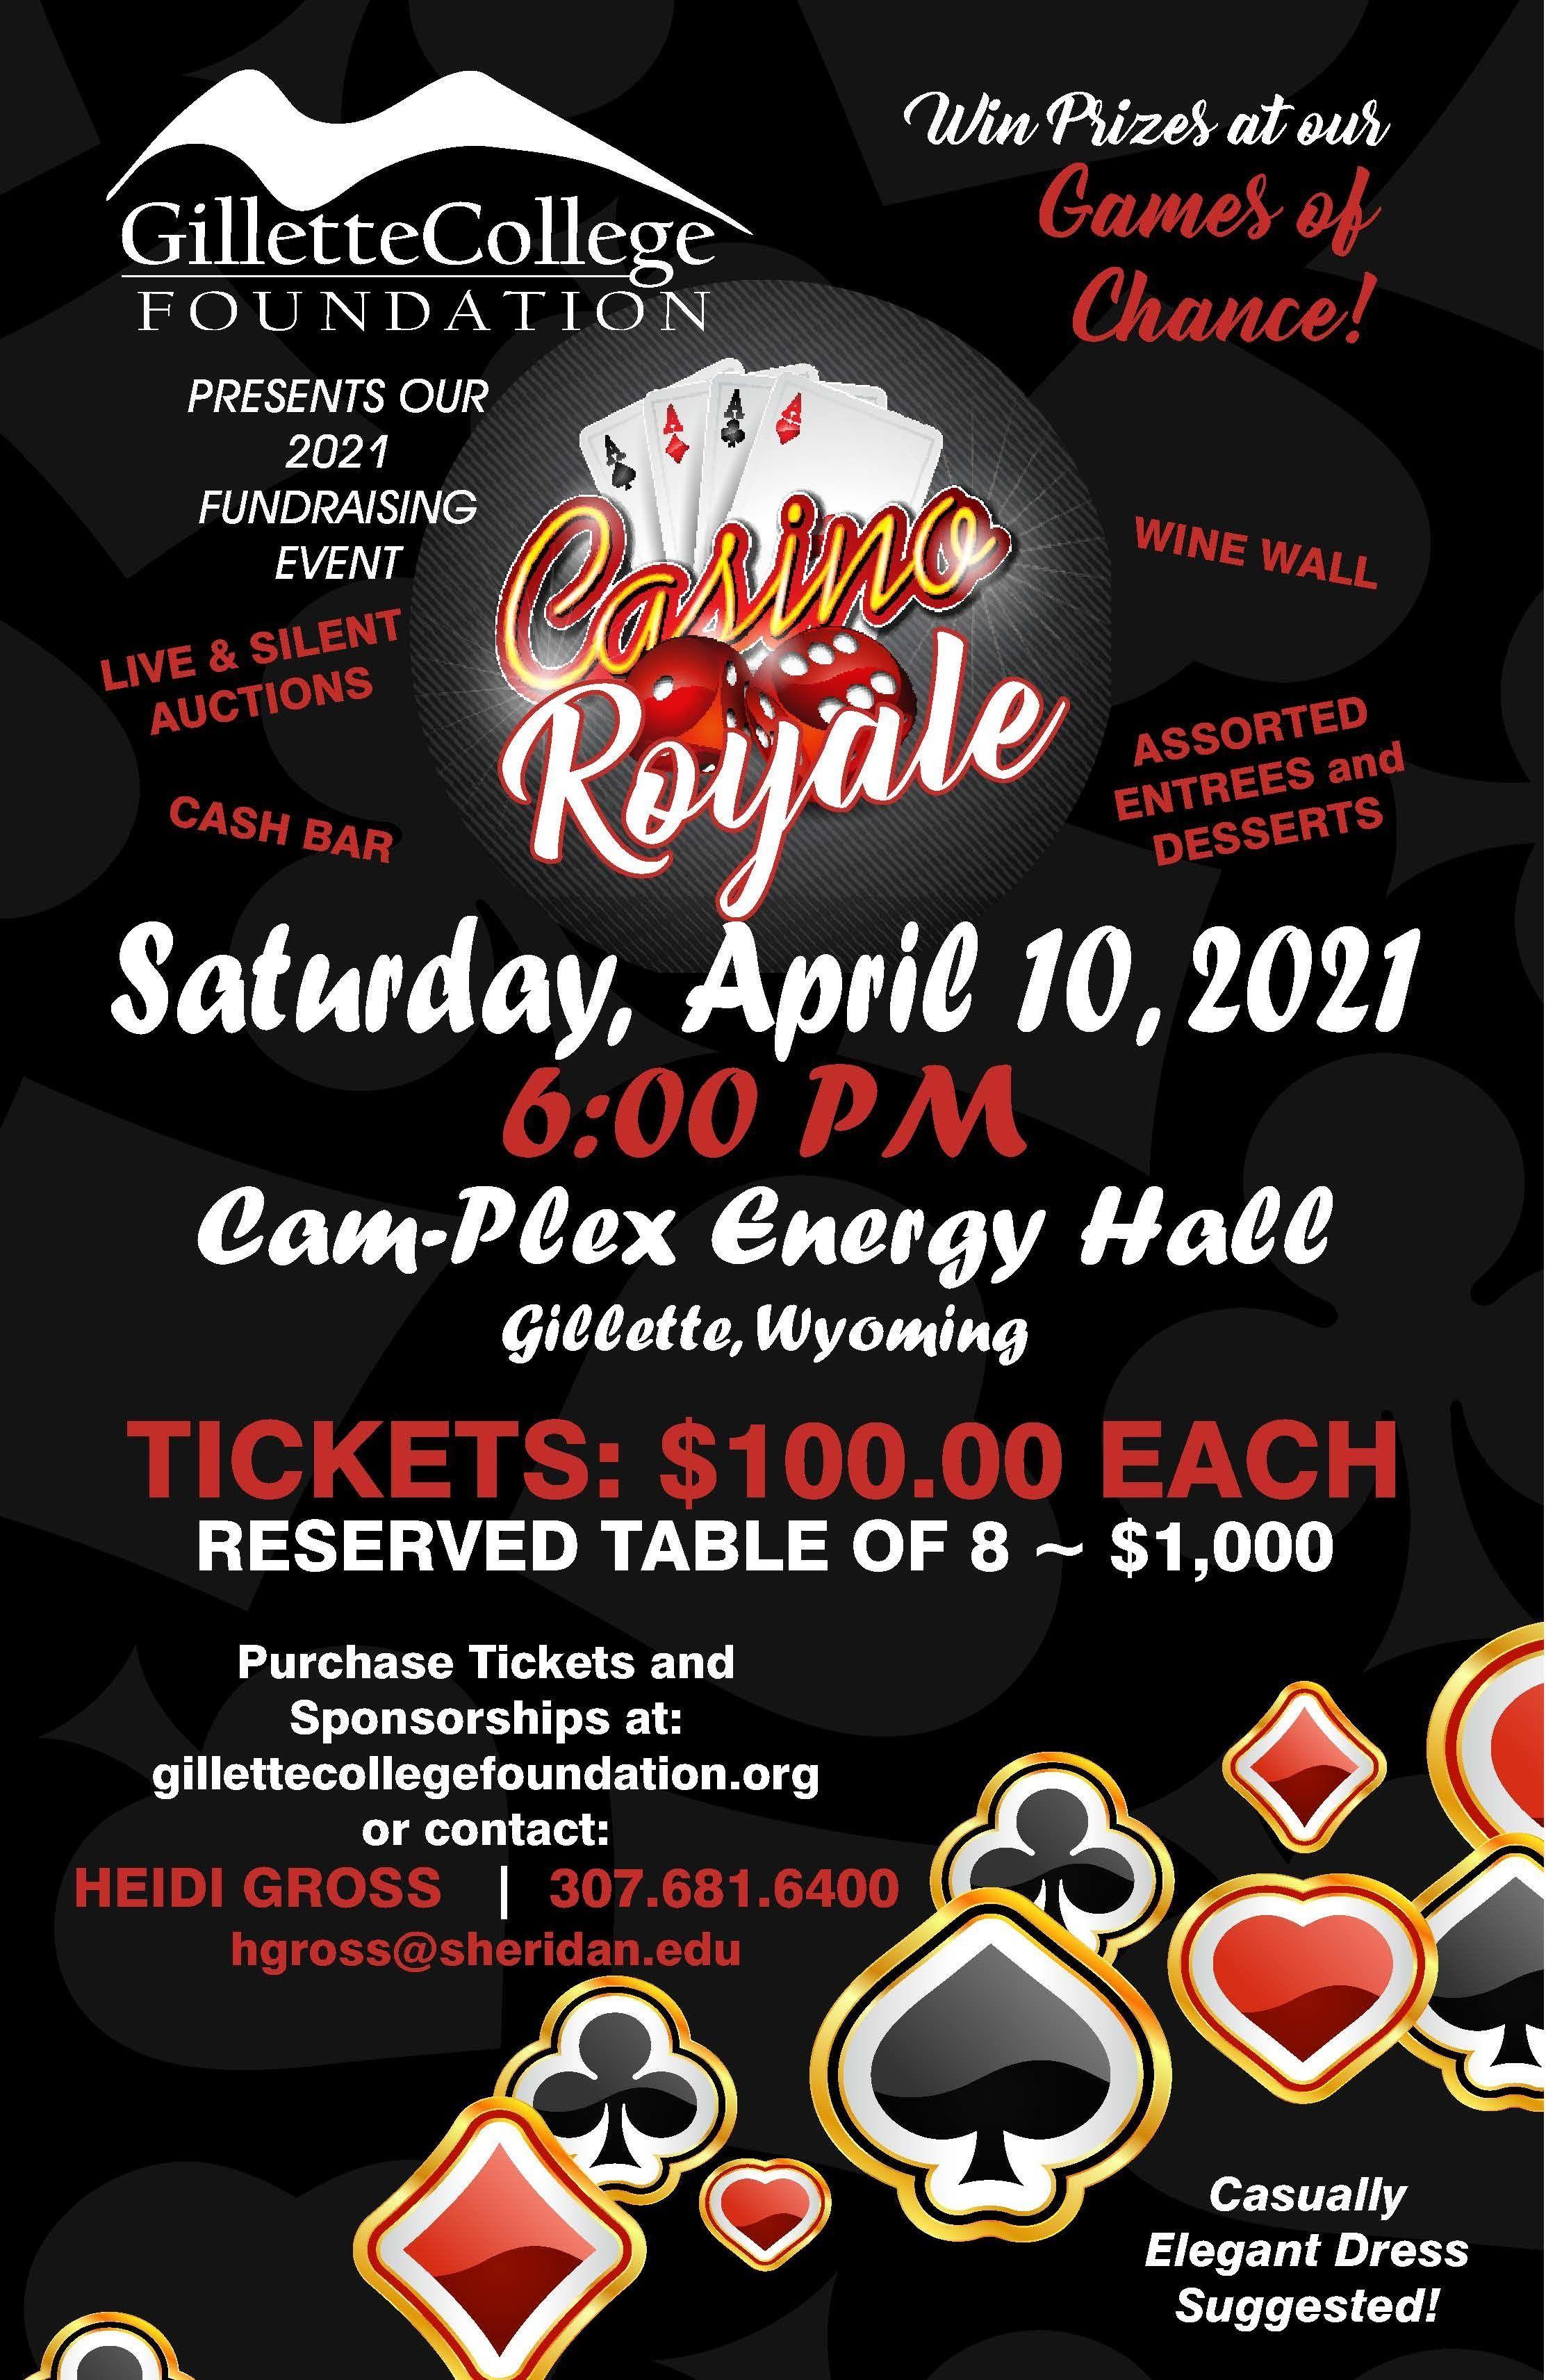 Gillette College Foundation Annual Fundraiser - Casino Royale